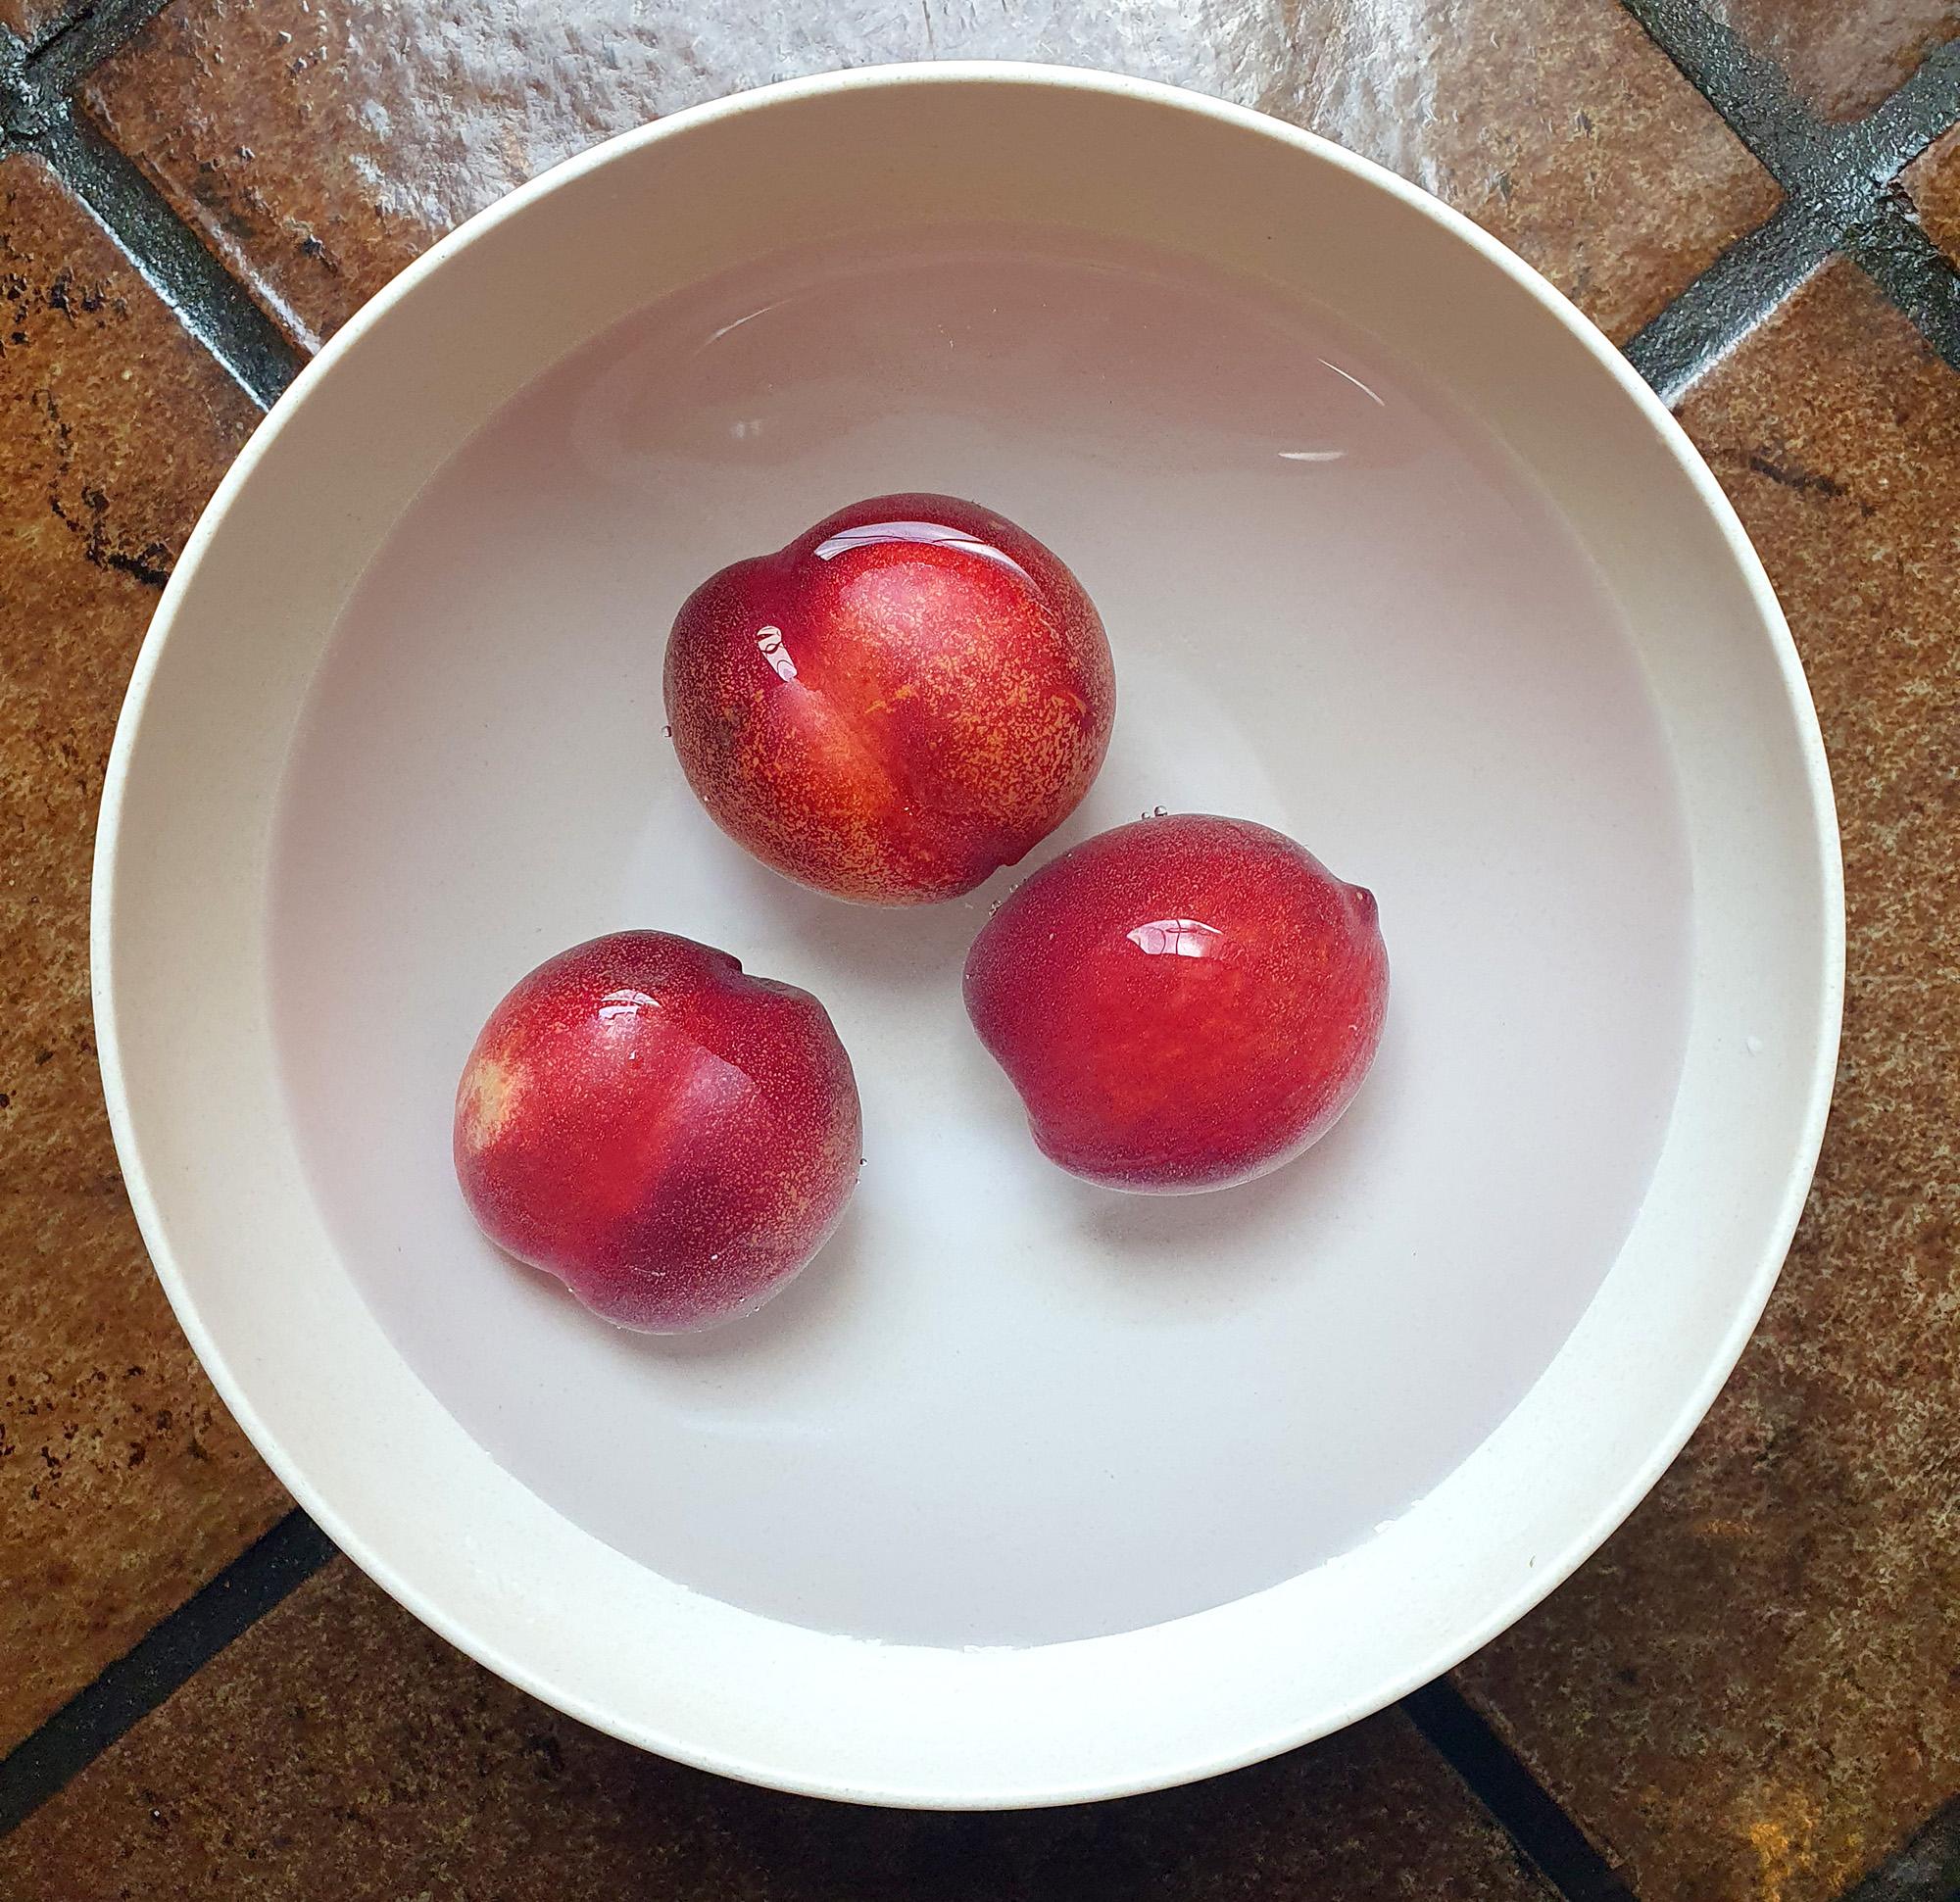 Tiga buah nektarin direndam dalam larutan baking soda. Foto oleh penulis.